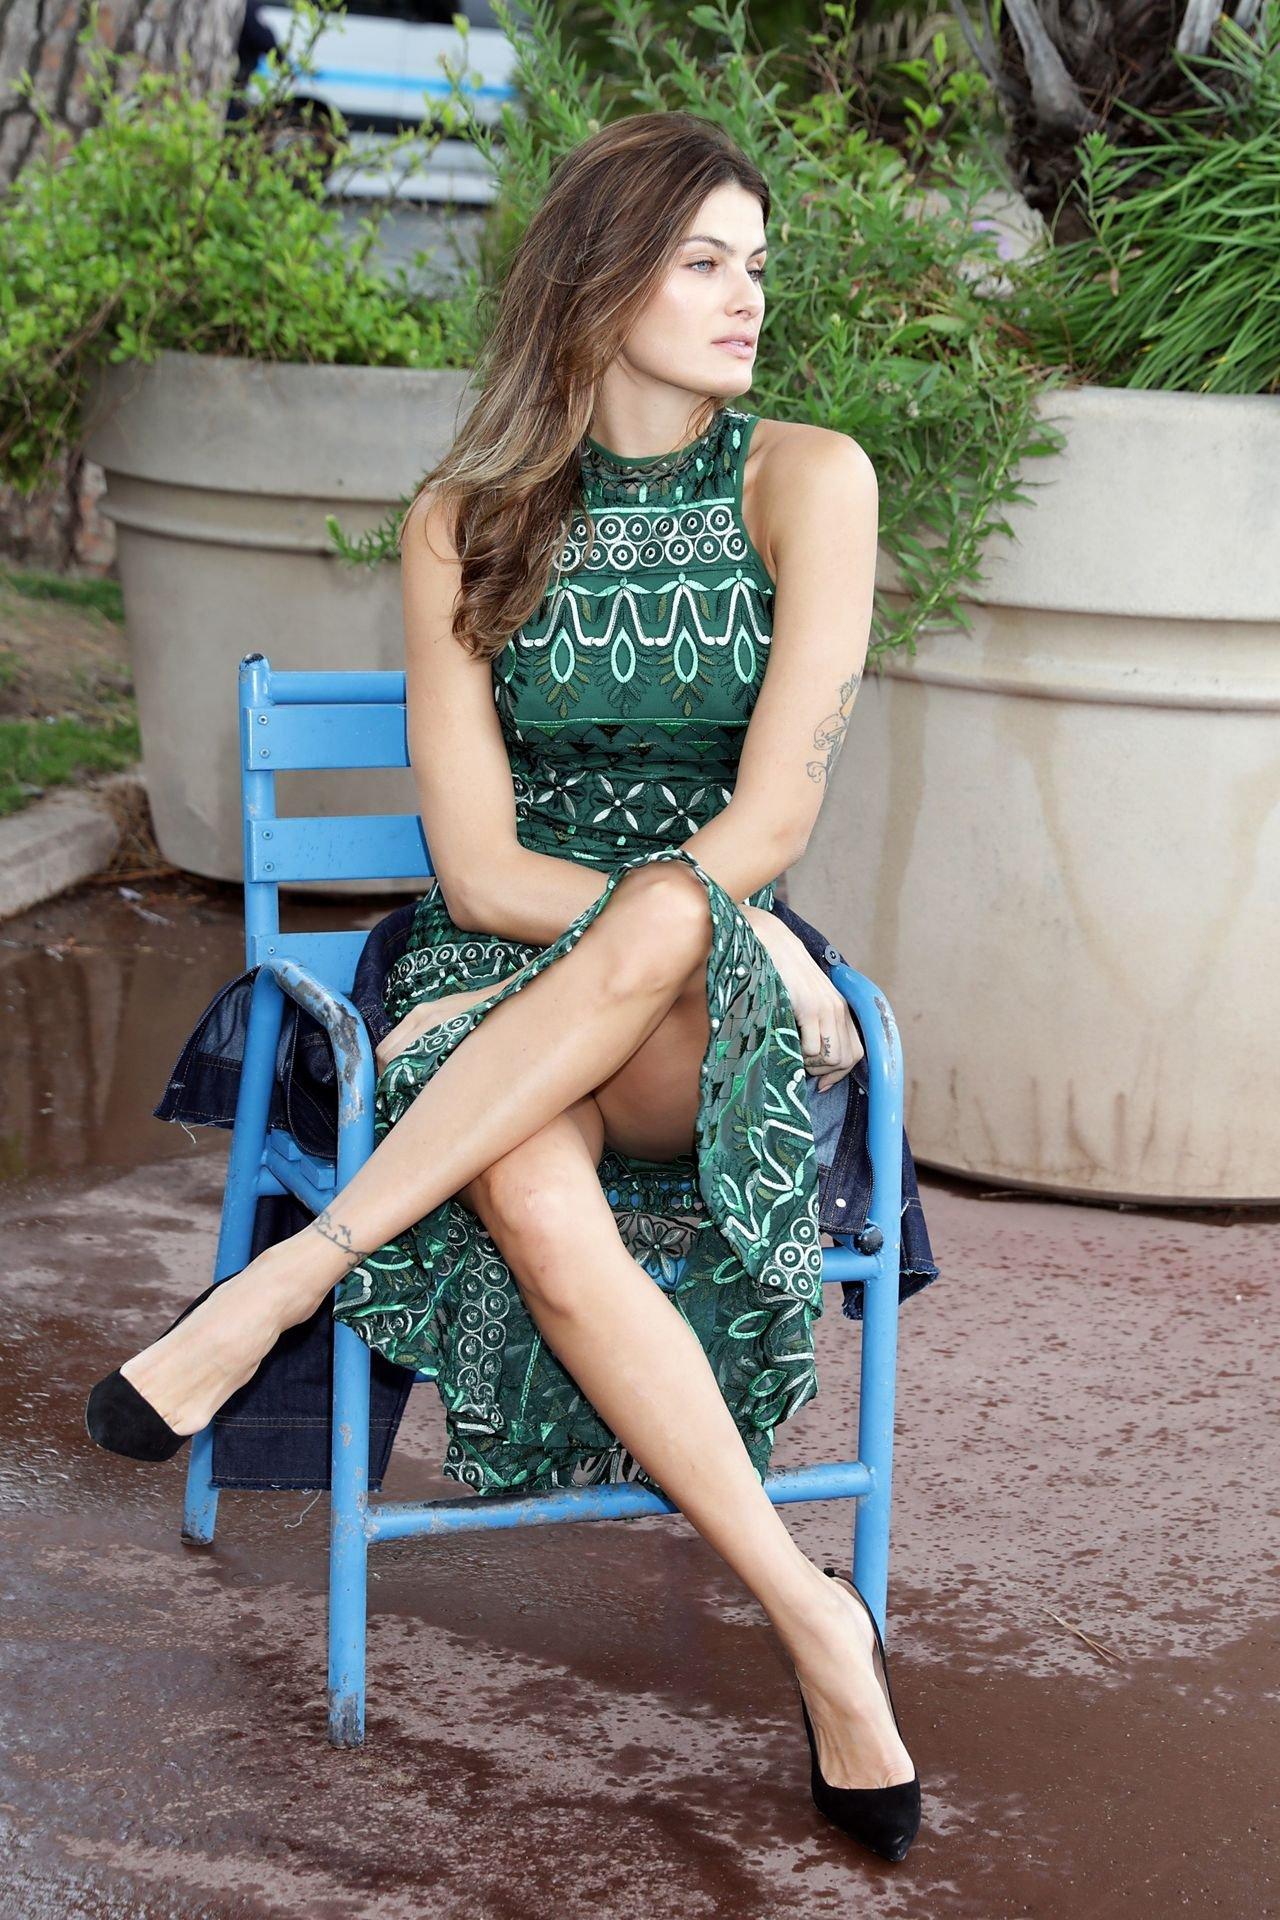 Isabeli Fontana - Pantyless Upskirt in Cannes | Hot Celebs